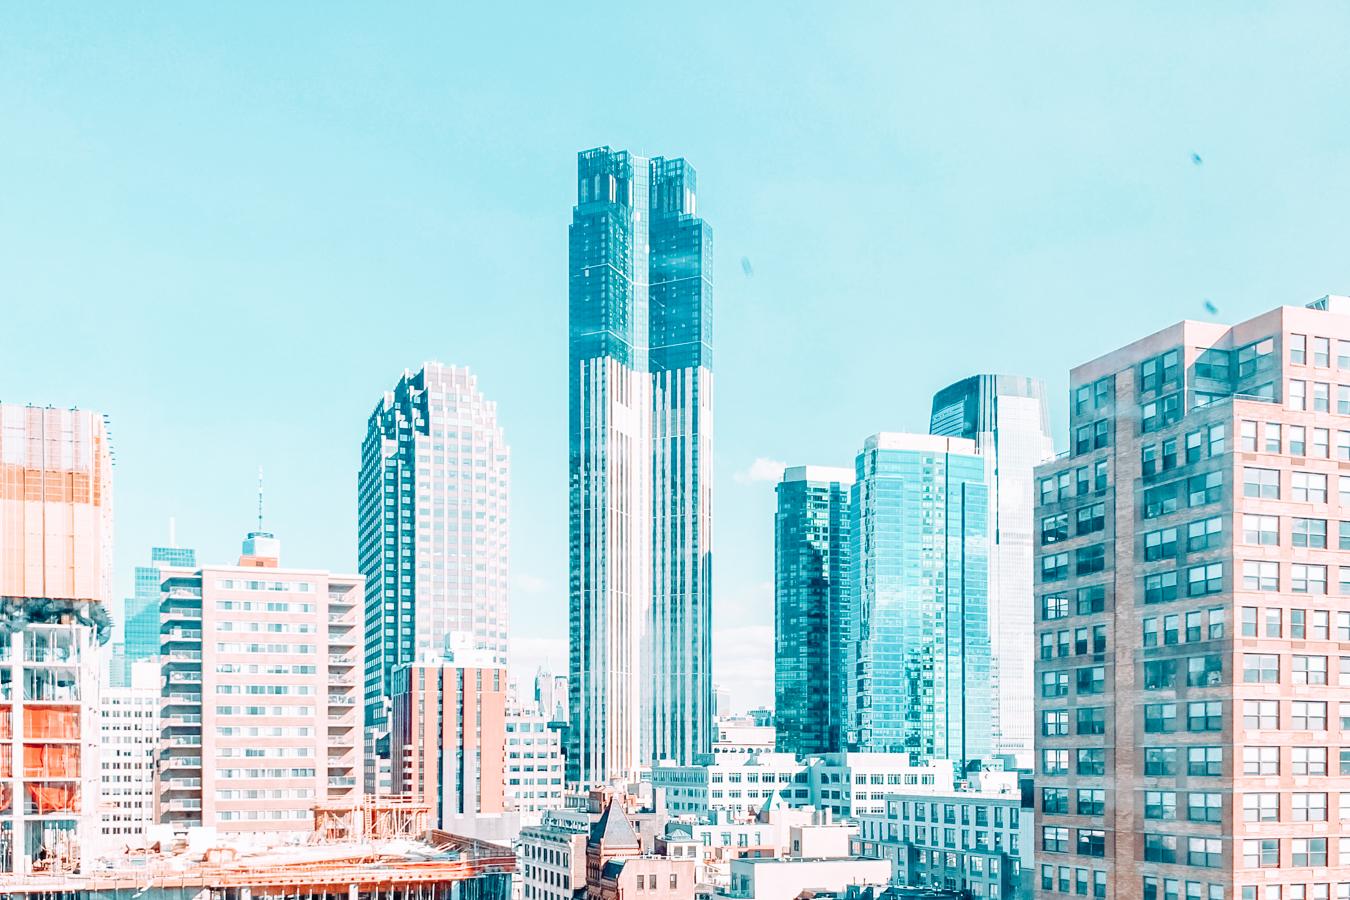 Buildings in Jersey City